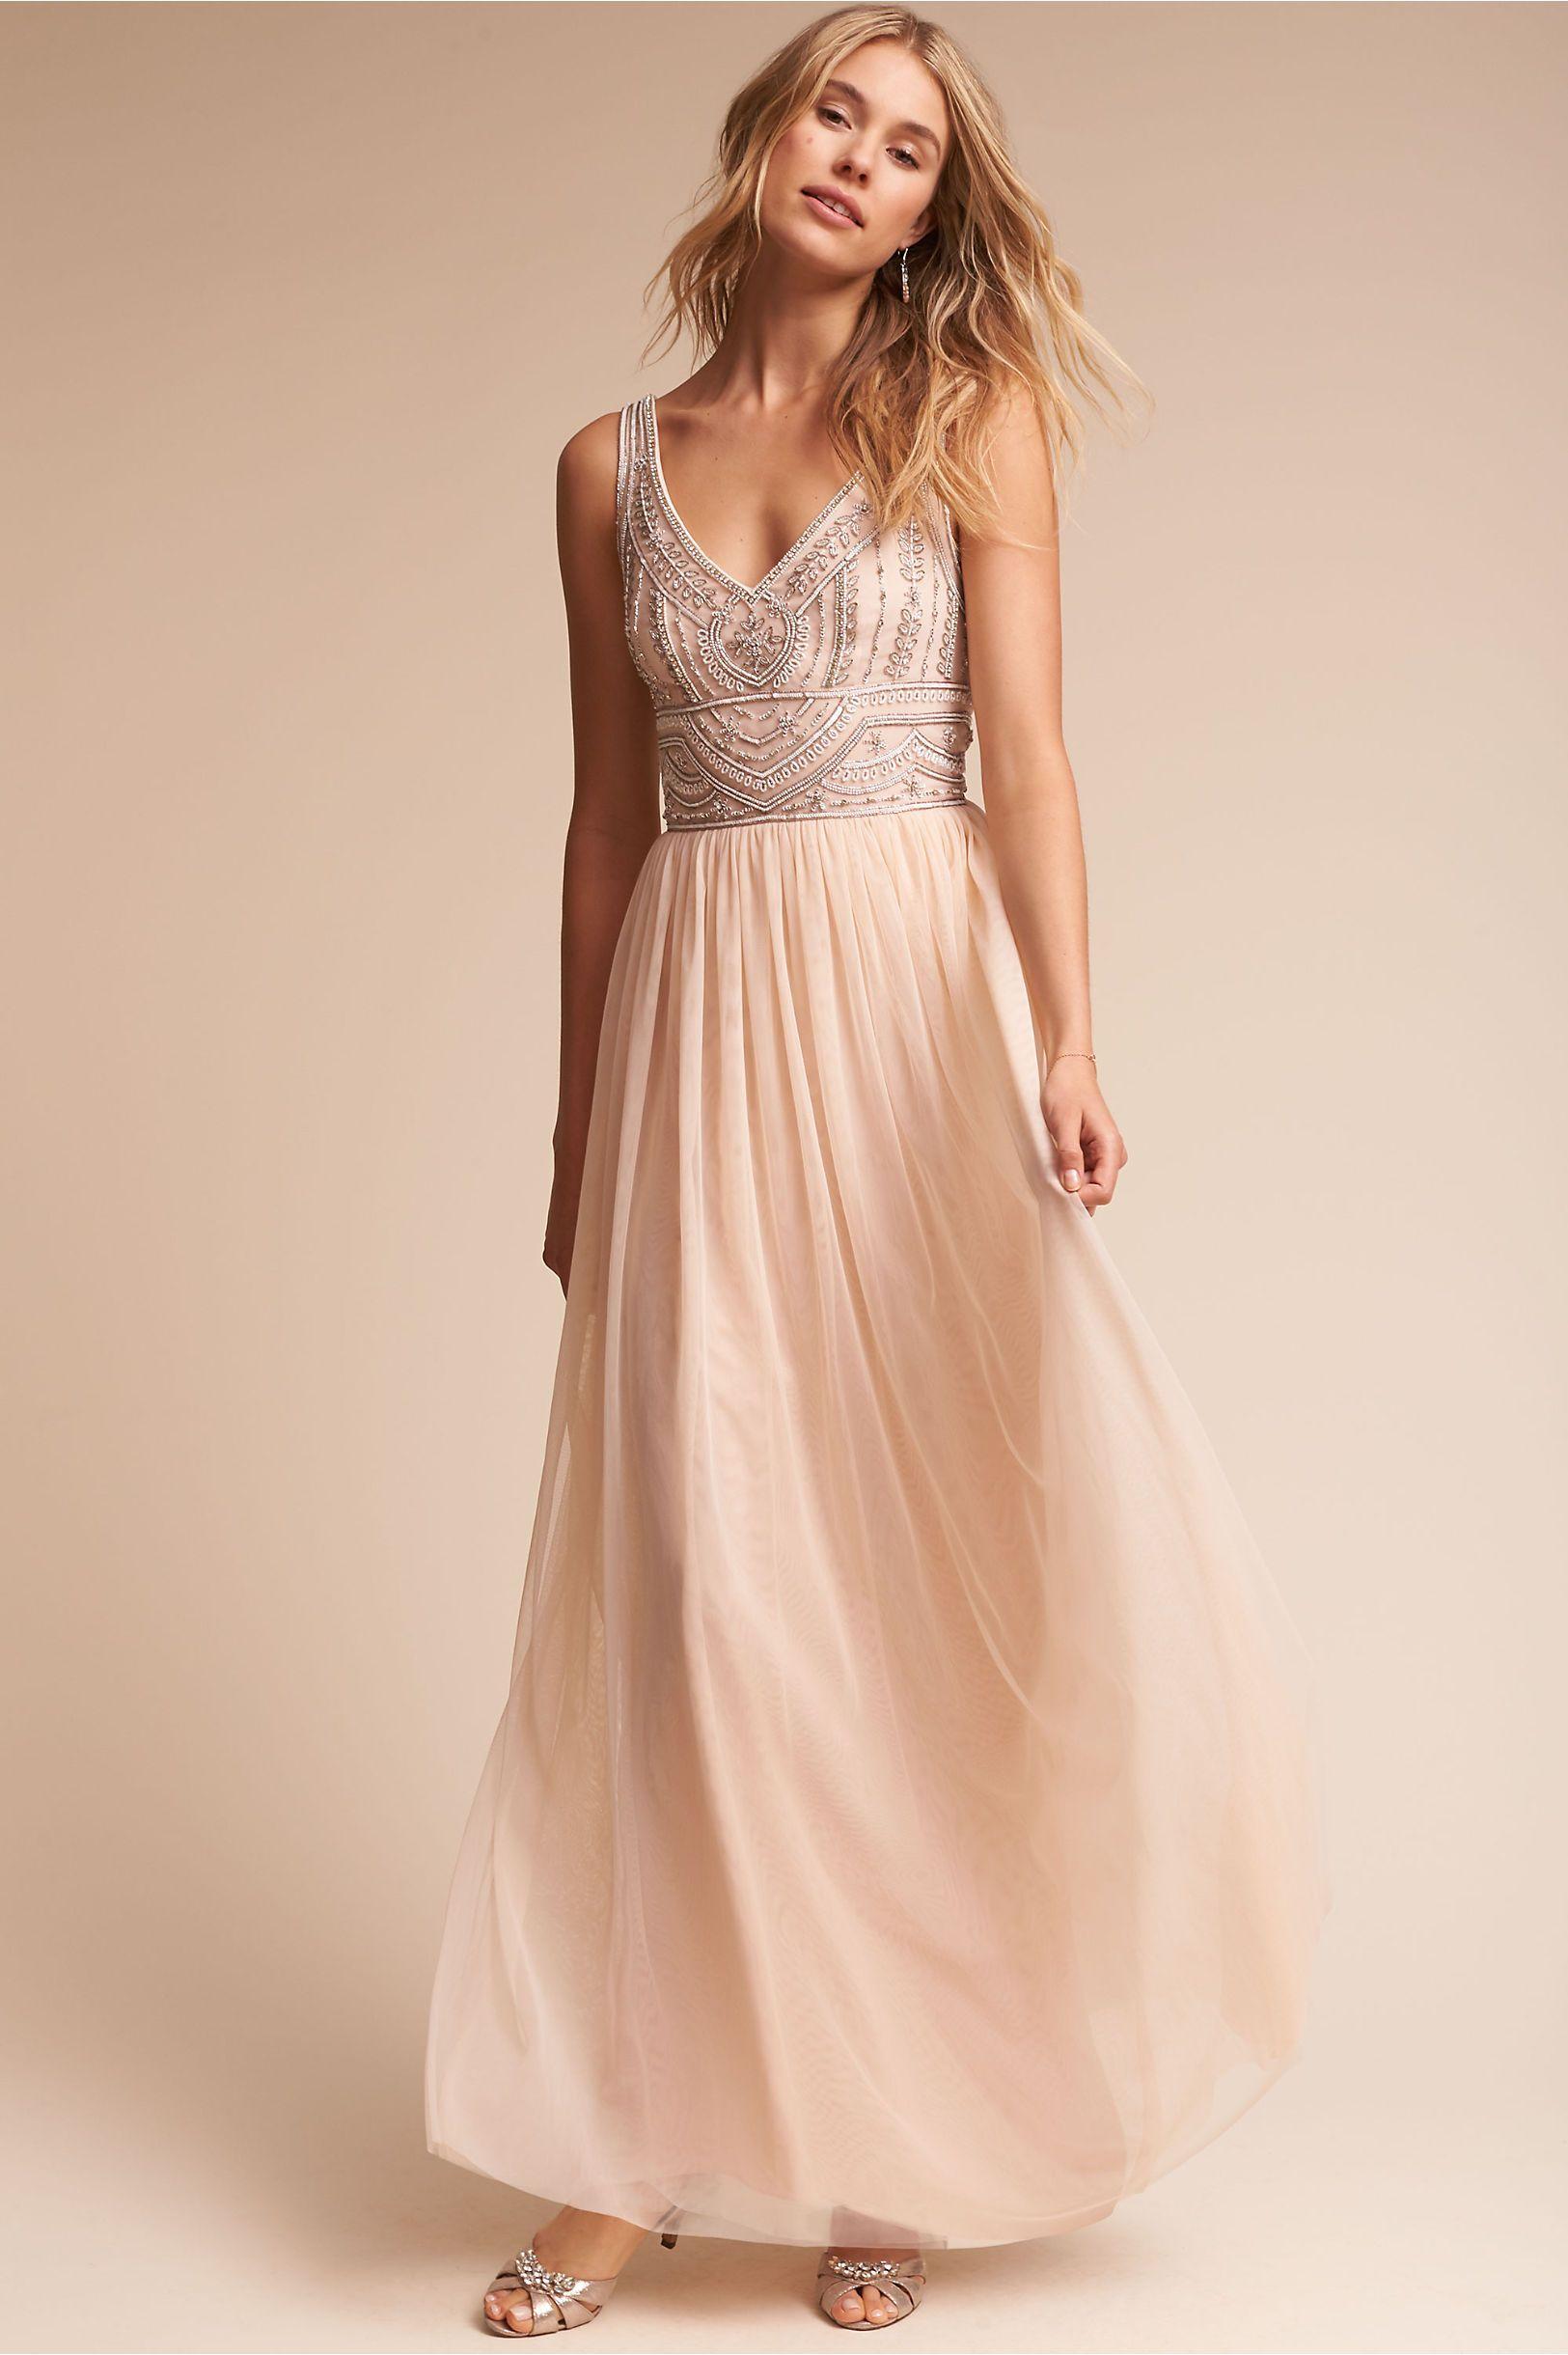 42d332d07efe BHLDN Oyster Sterling Dress in Bridal Party | BHLDN | Mi Estilo ...